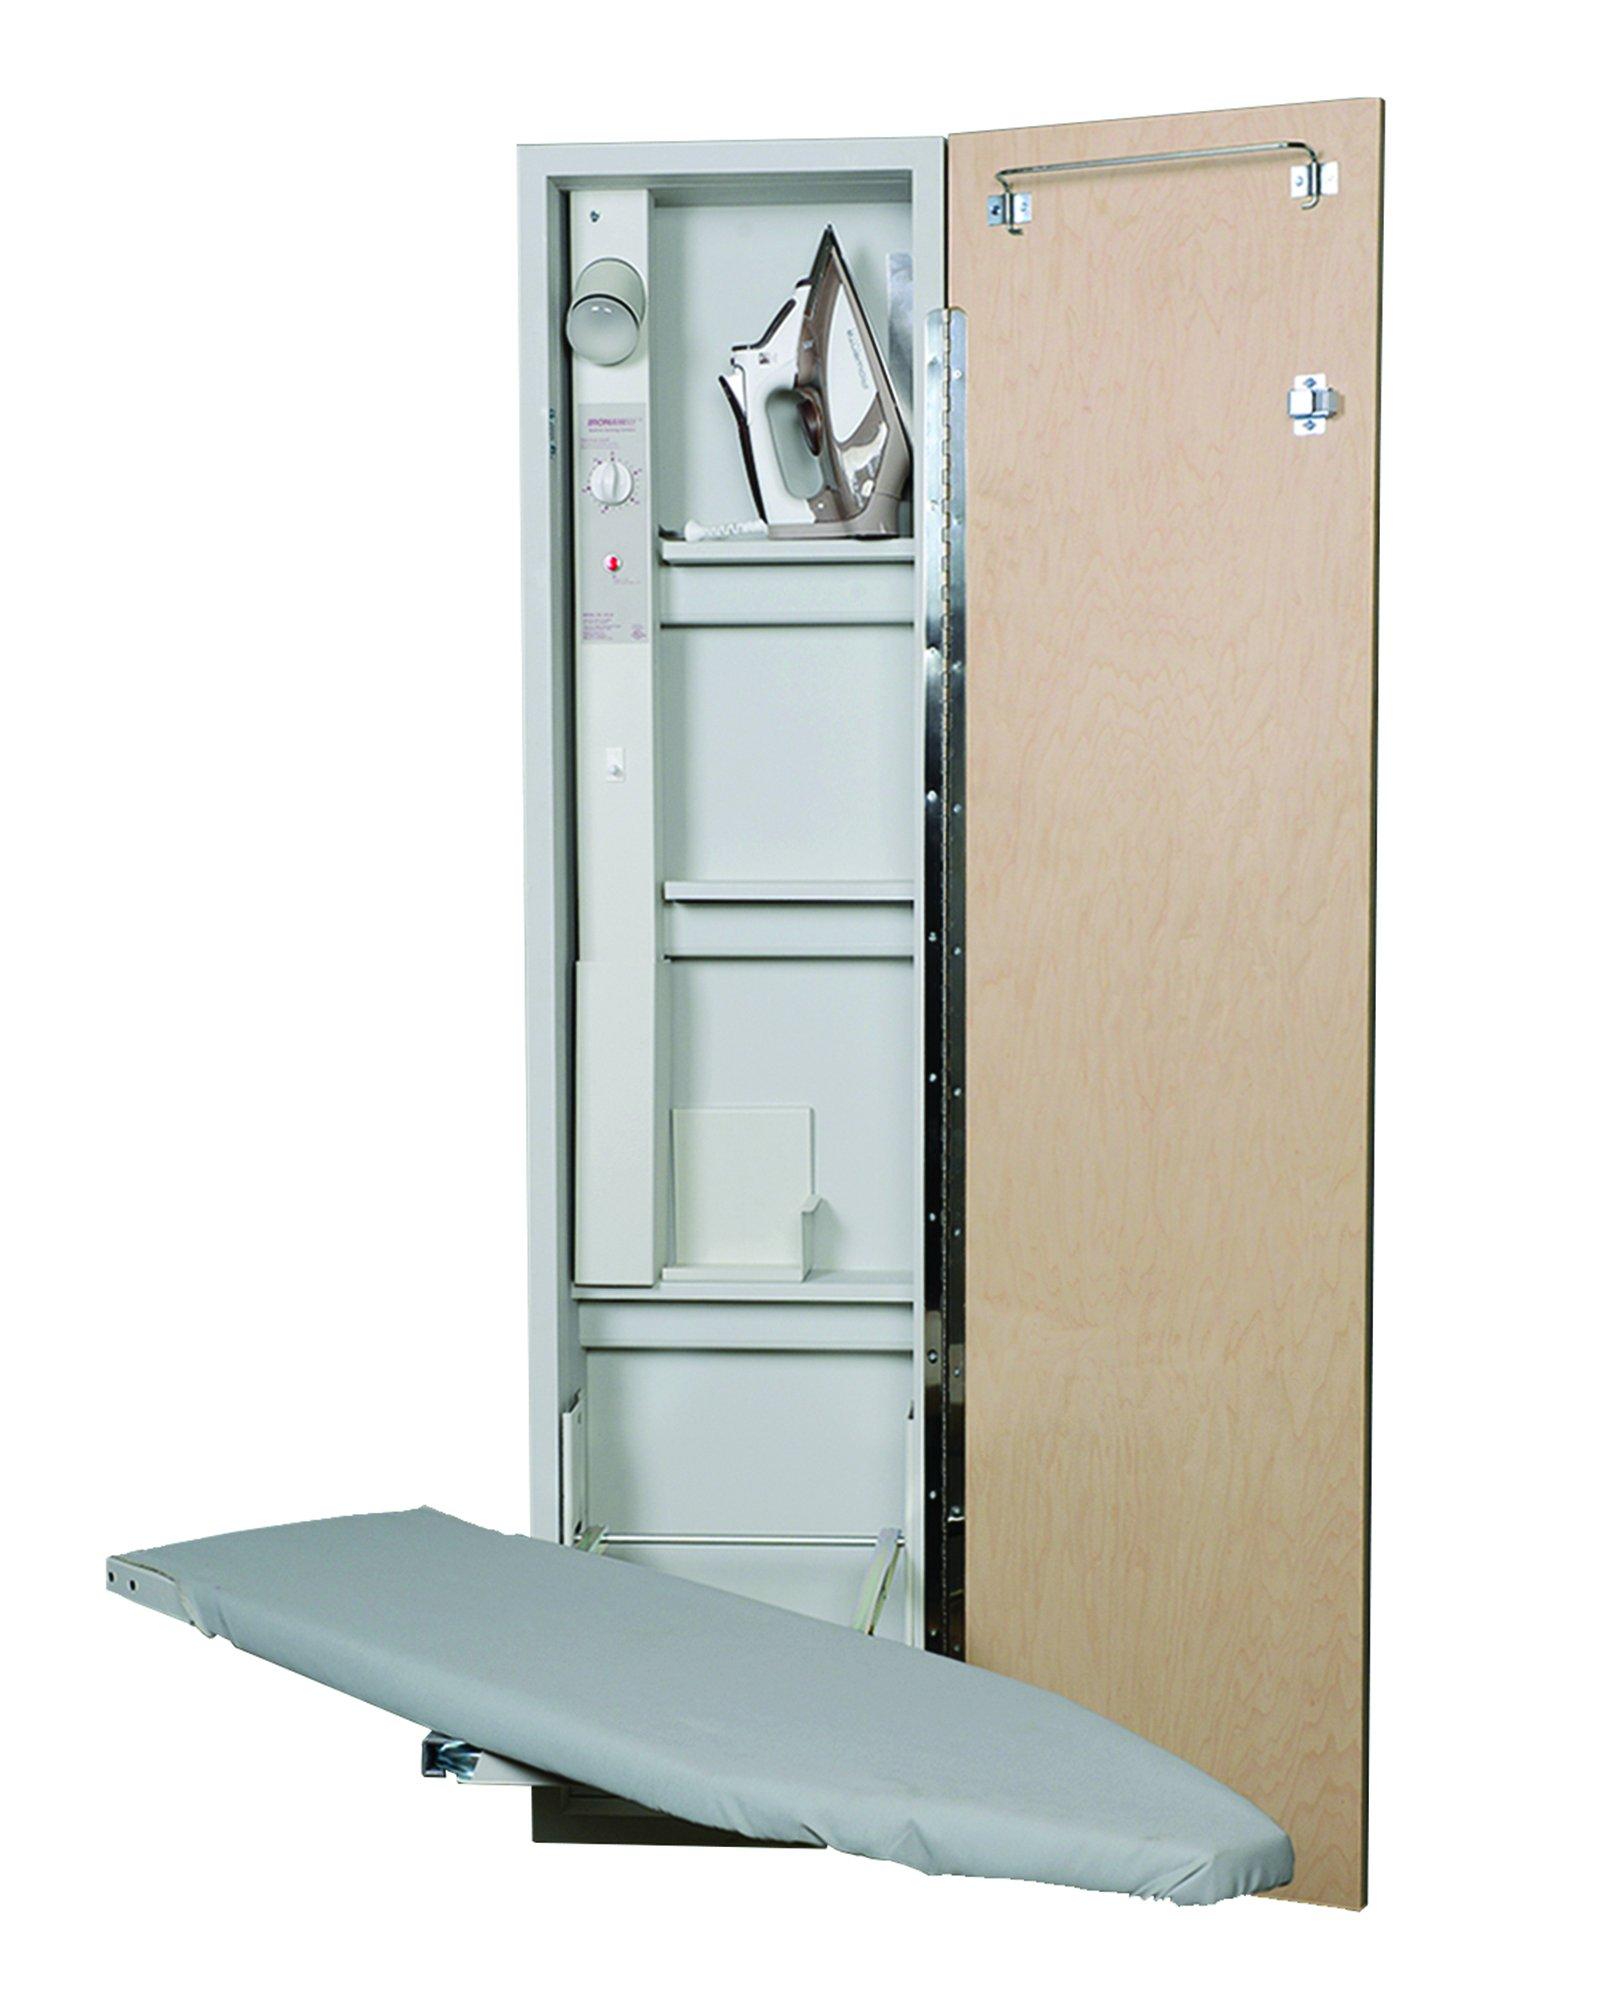 Iron A Way AE-46 Premium Electric Swivel Ironing Center, Raised Oak Panel Door